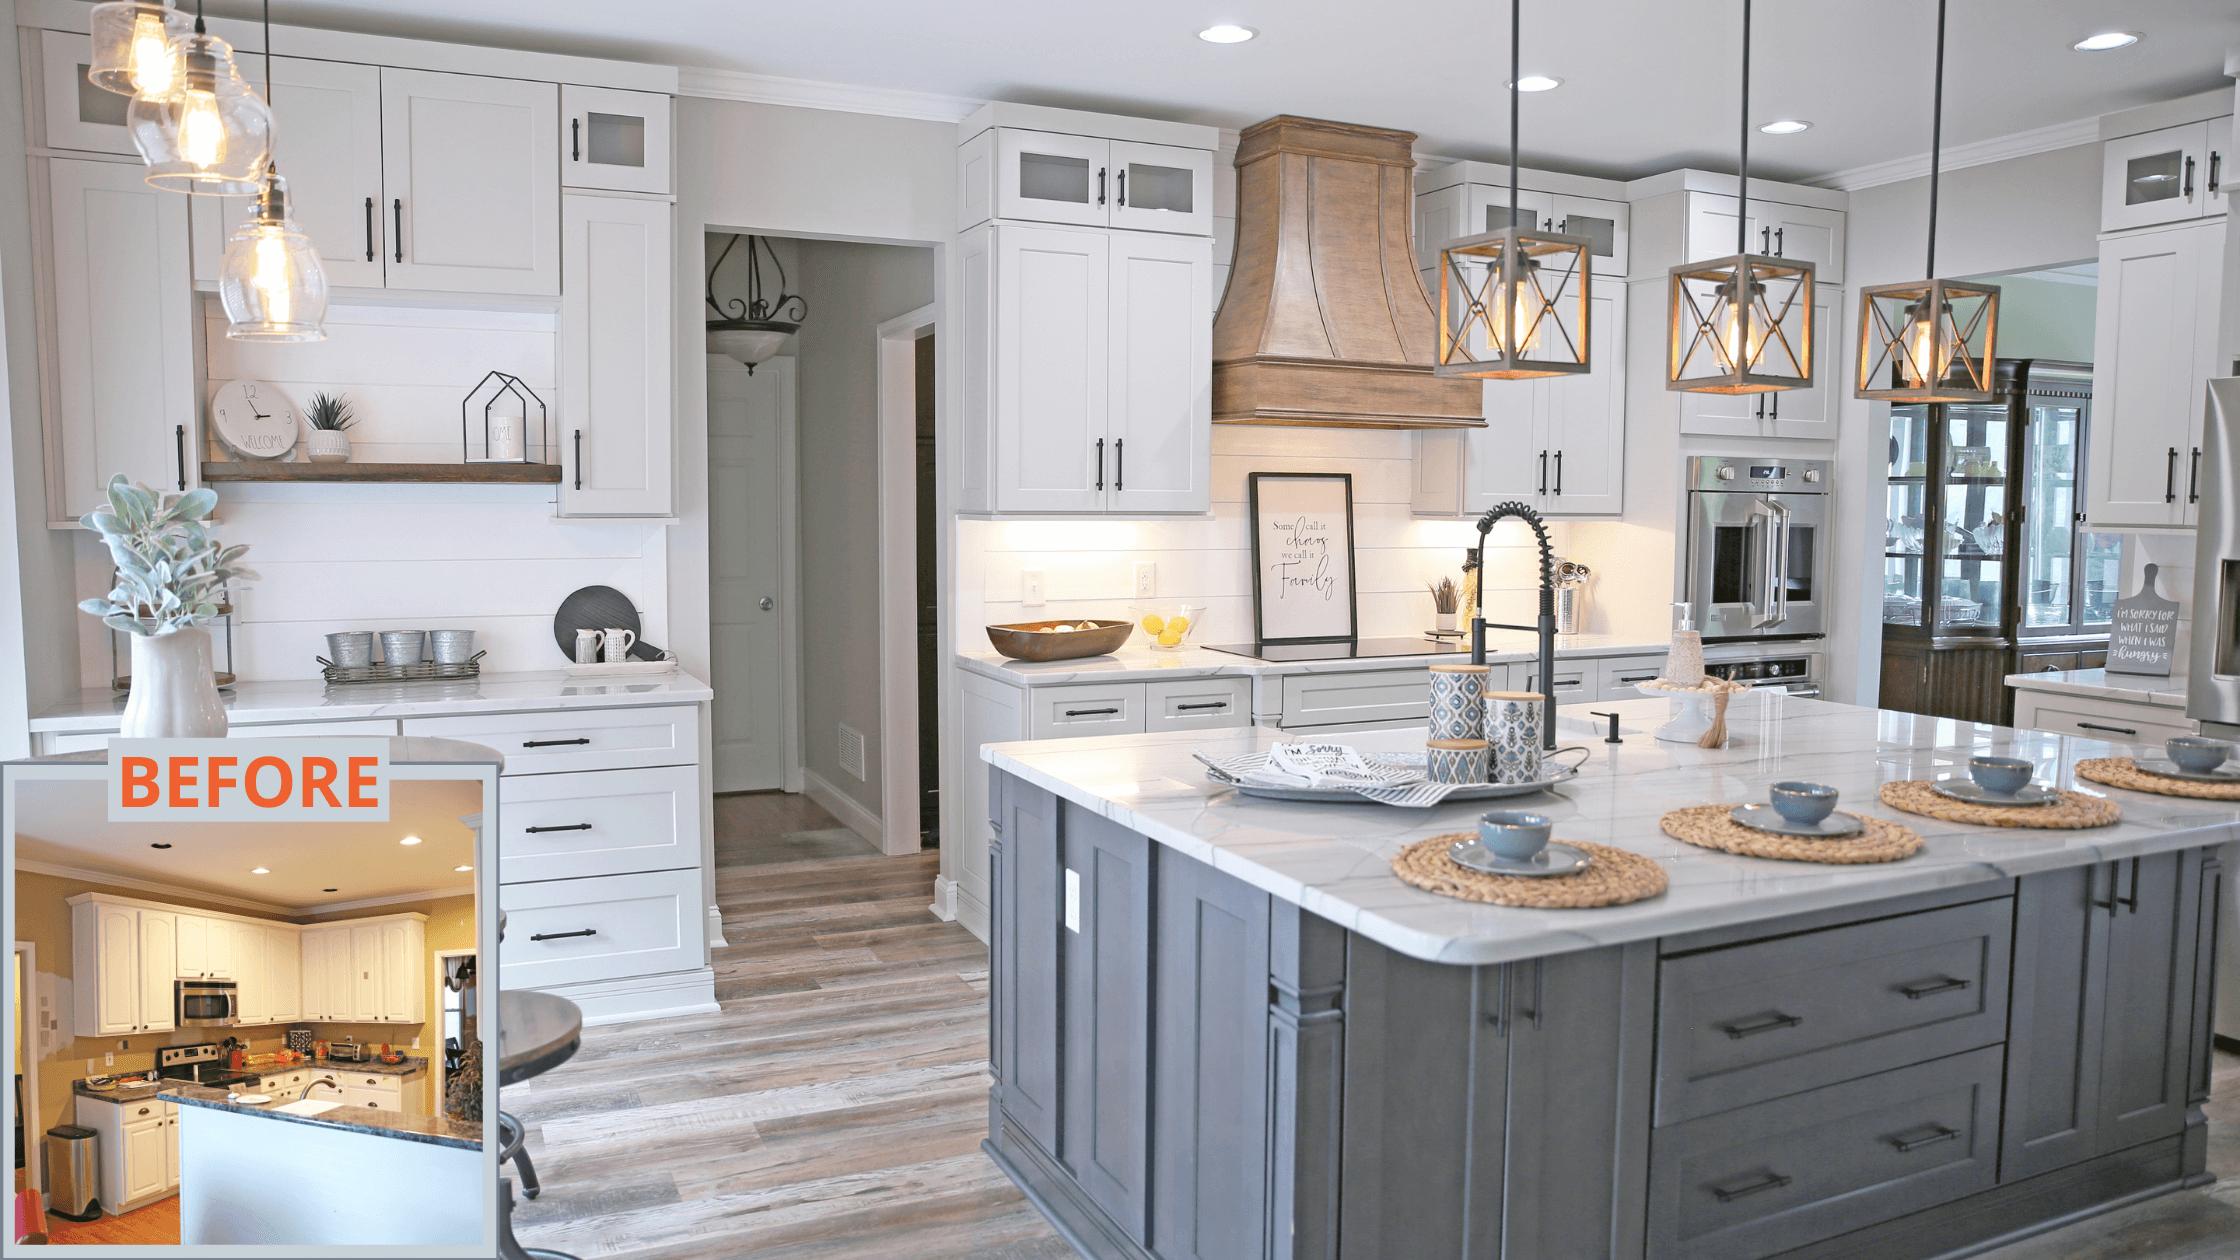 7 Common Kitchen Remodel Mistakes to Avoid